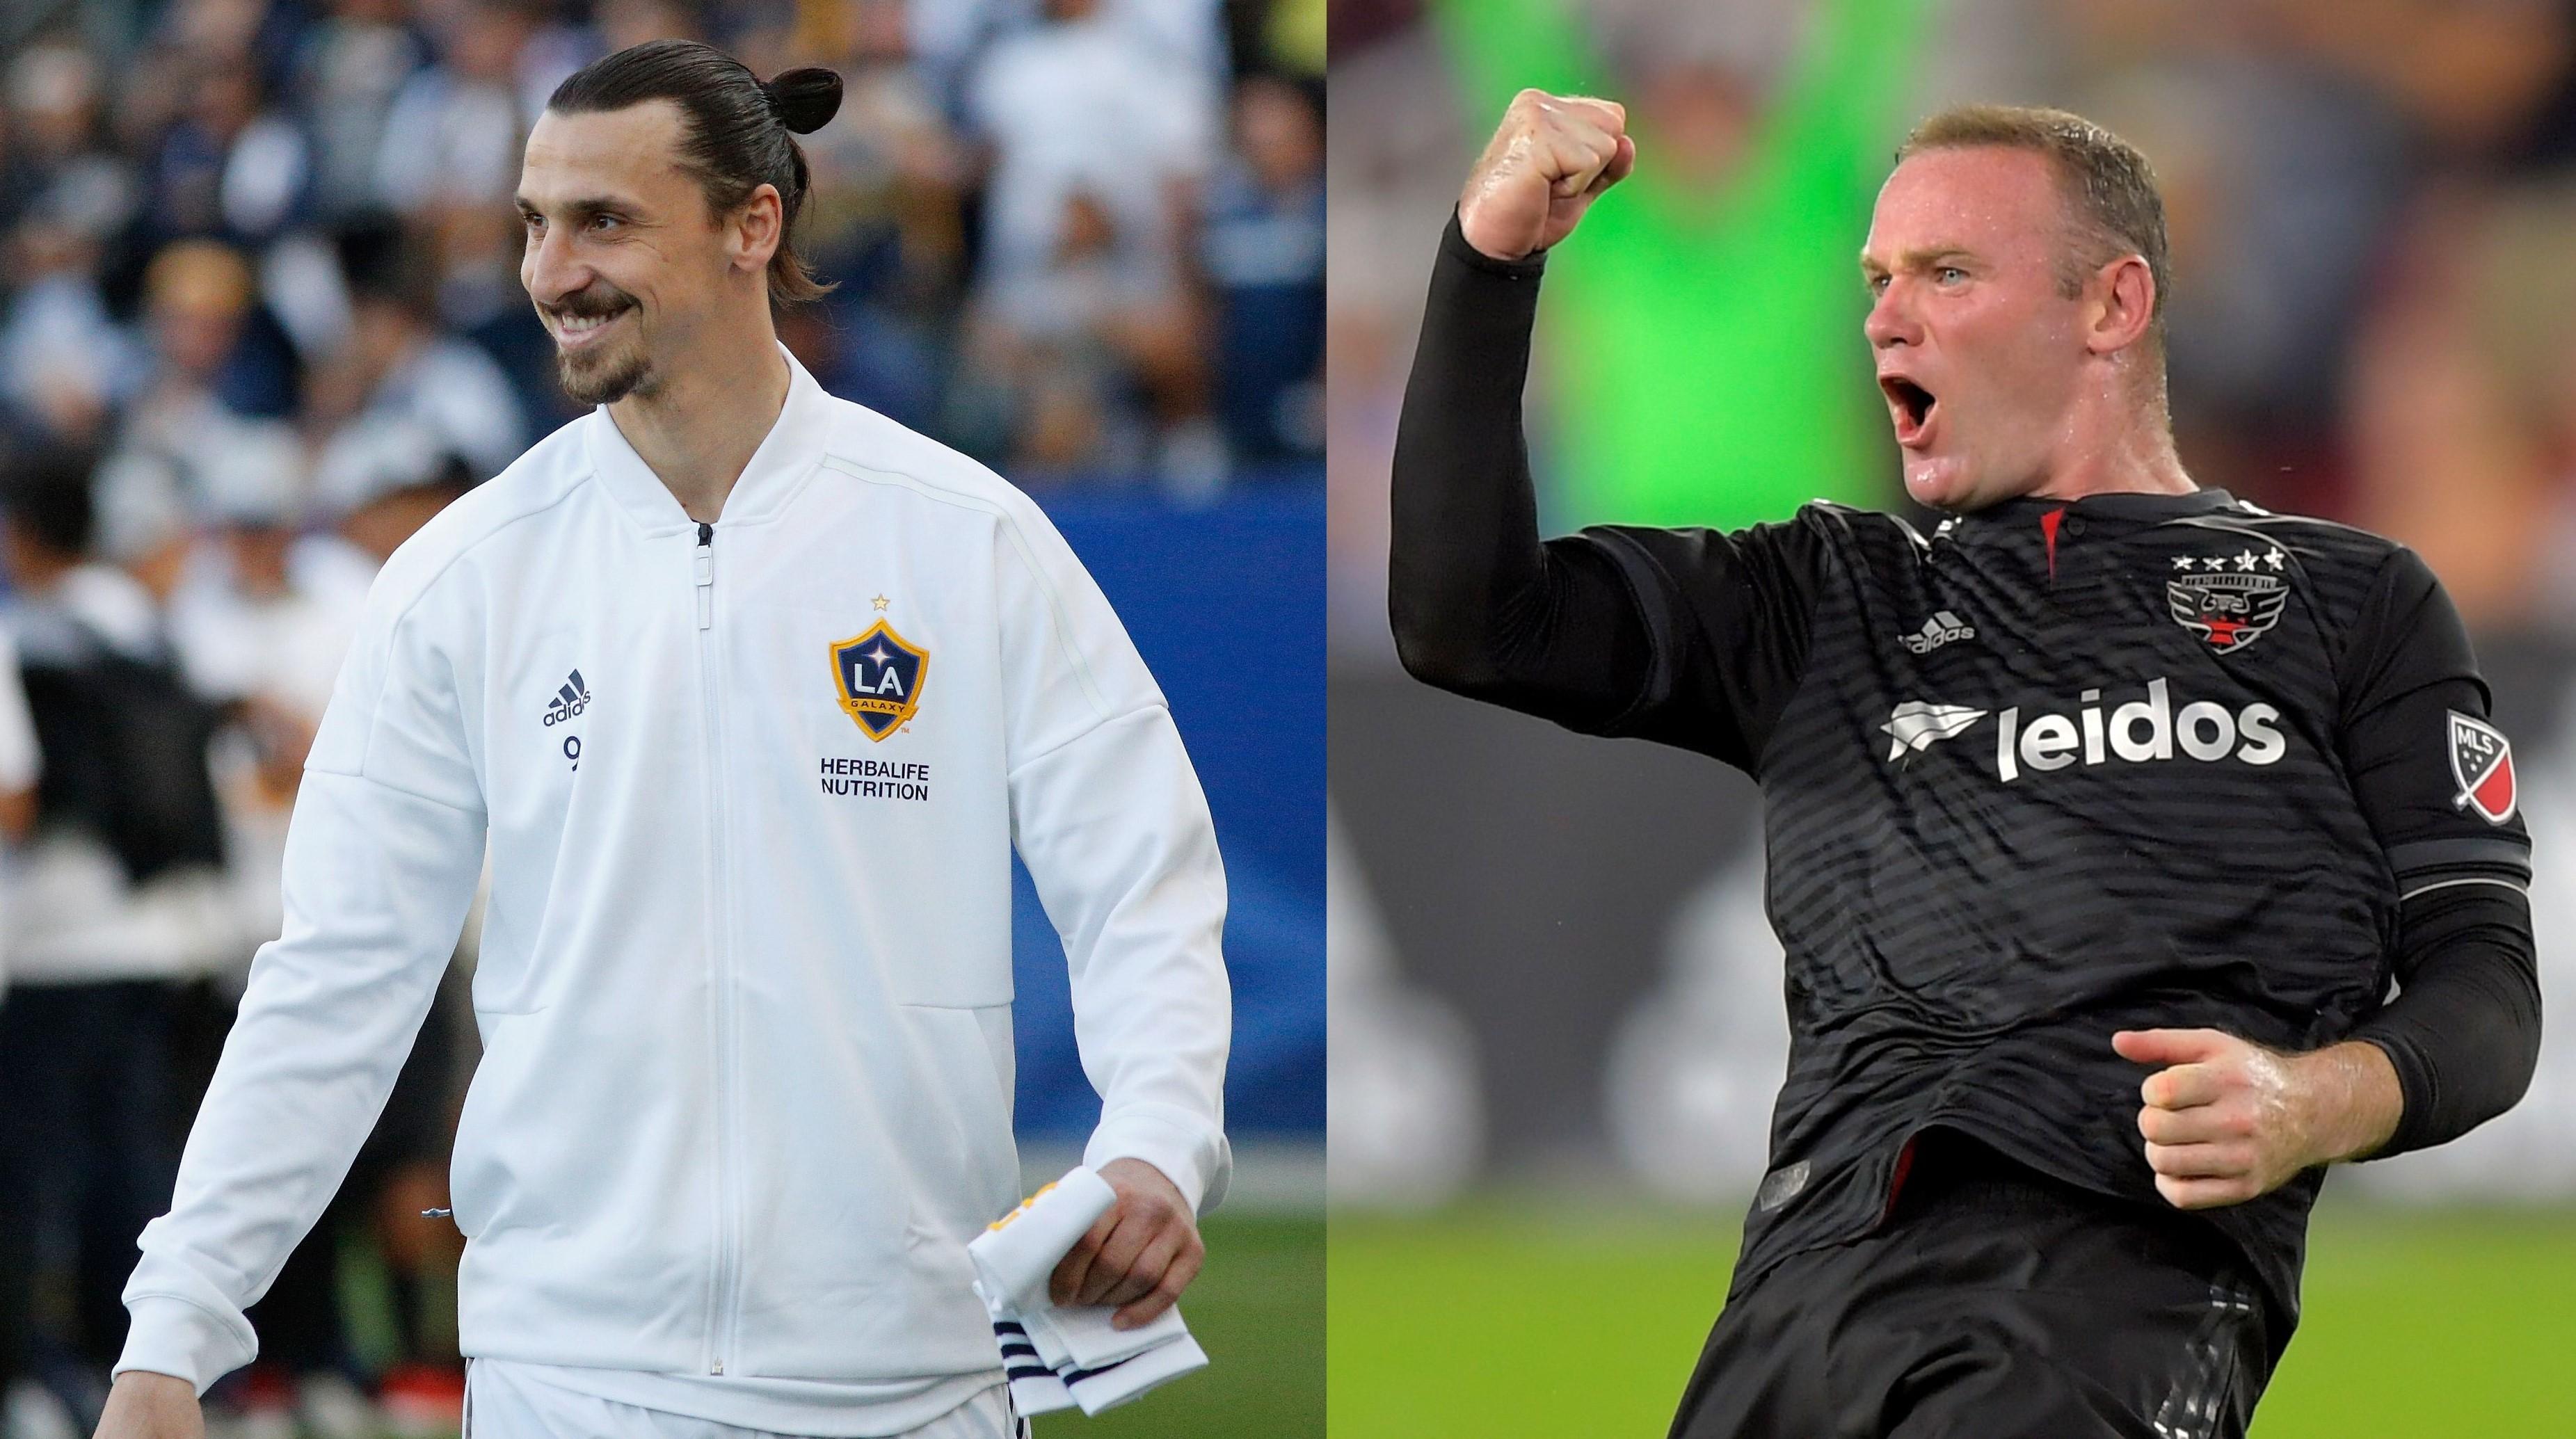 9fbe102d8 Zlatan Ibrahimovic and Wayne Rooney are dominating the MLS this season …  again